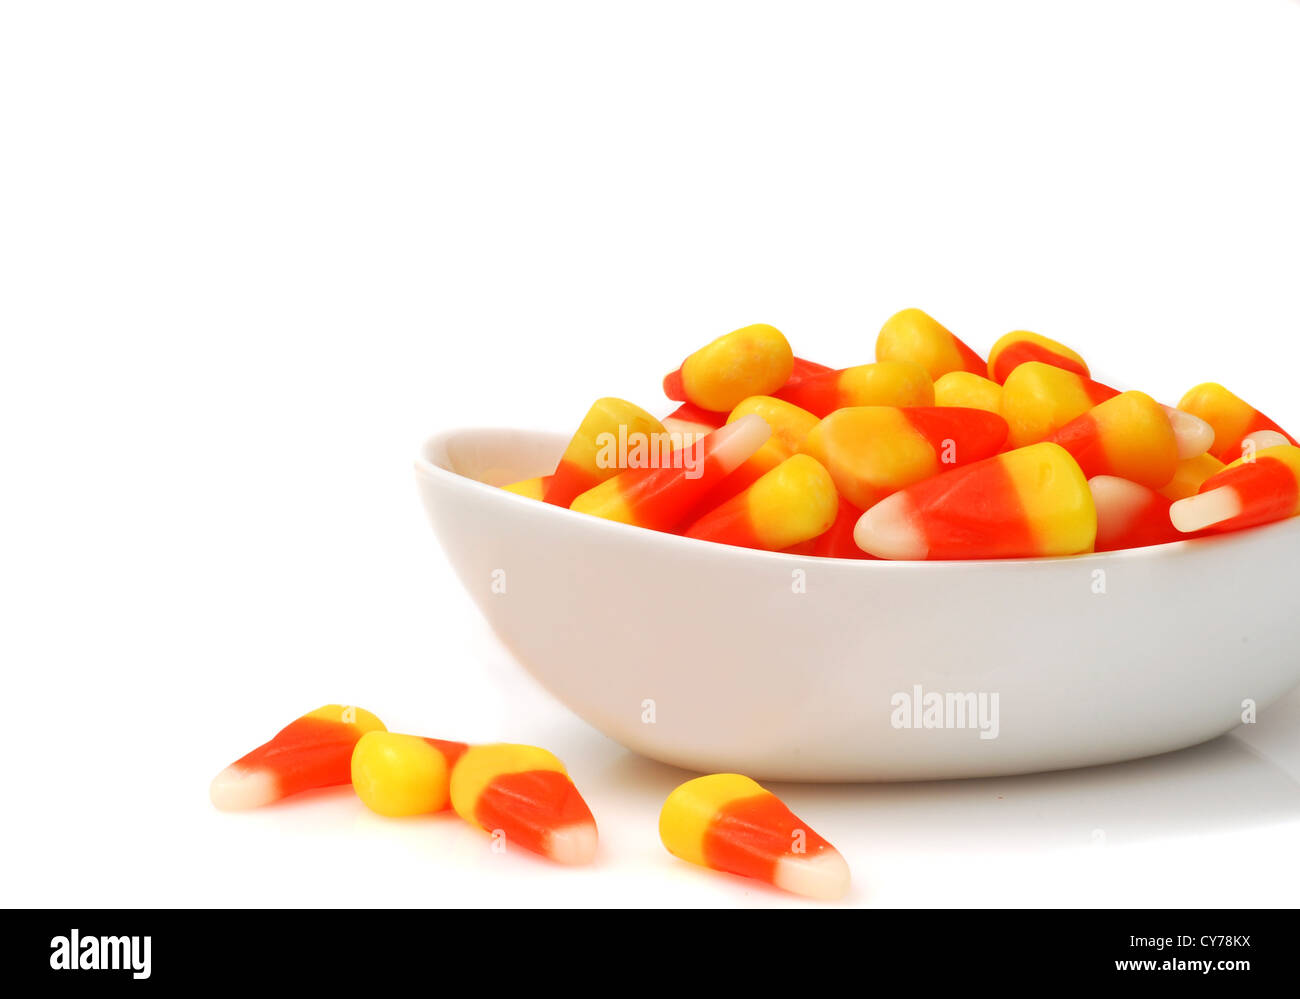 Halloween Candy Corn Stockfotos & Halloween Candy Corn Bilder - Alamy